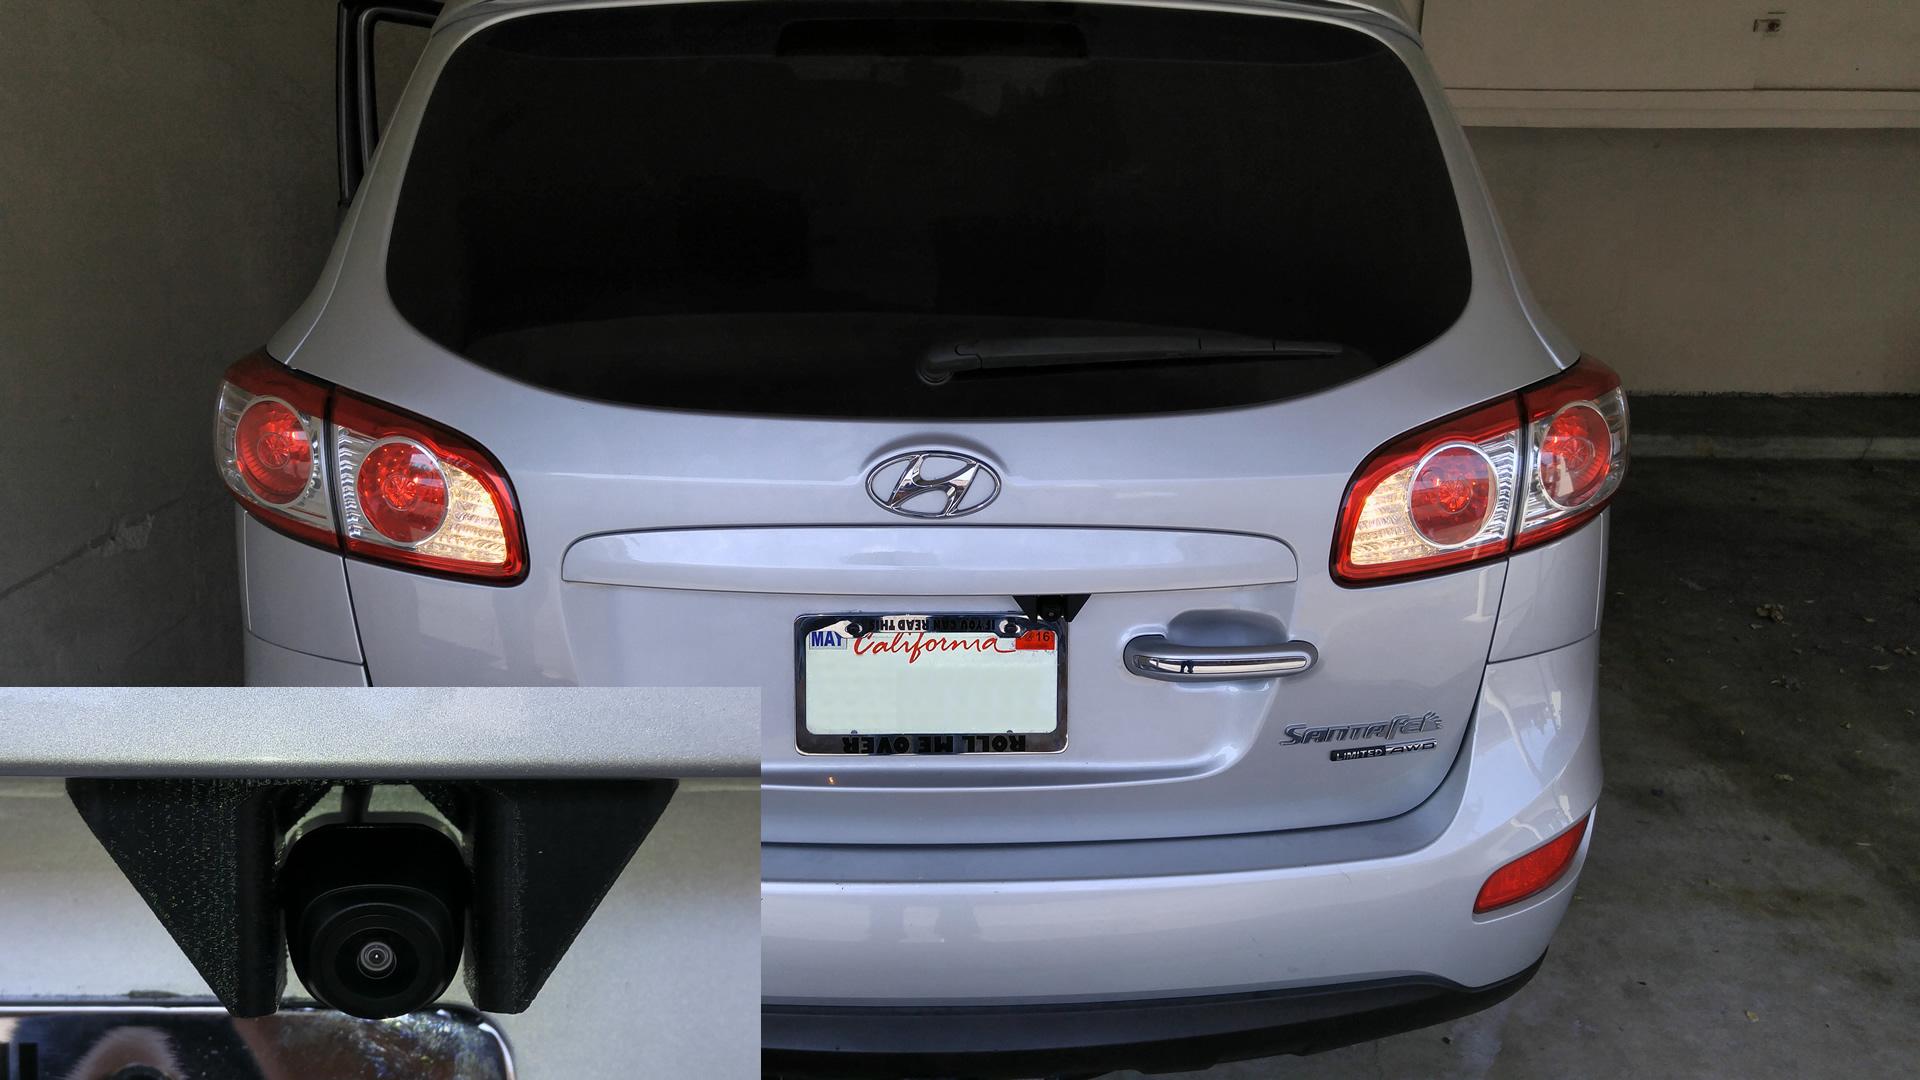 car 3d printed rear view camera mount eleccelerator. Black Bedroom Furniture Sets. Home Design Ideas